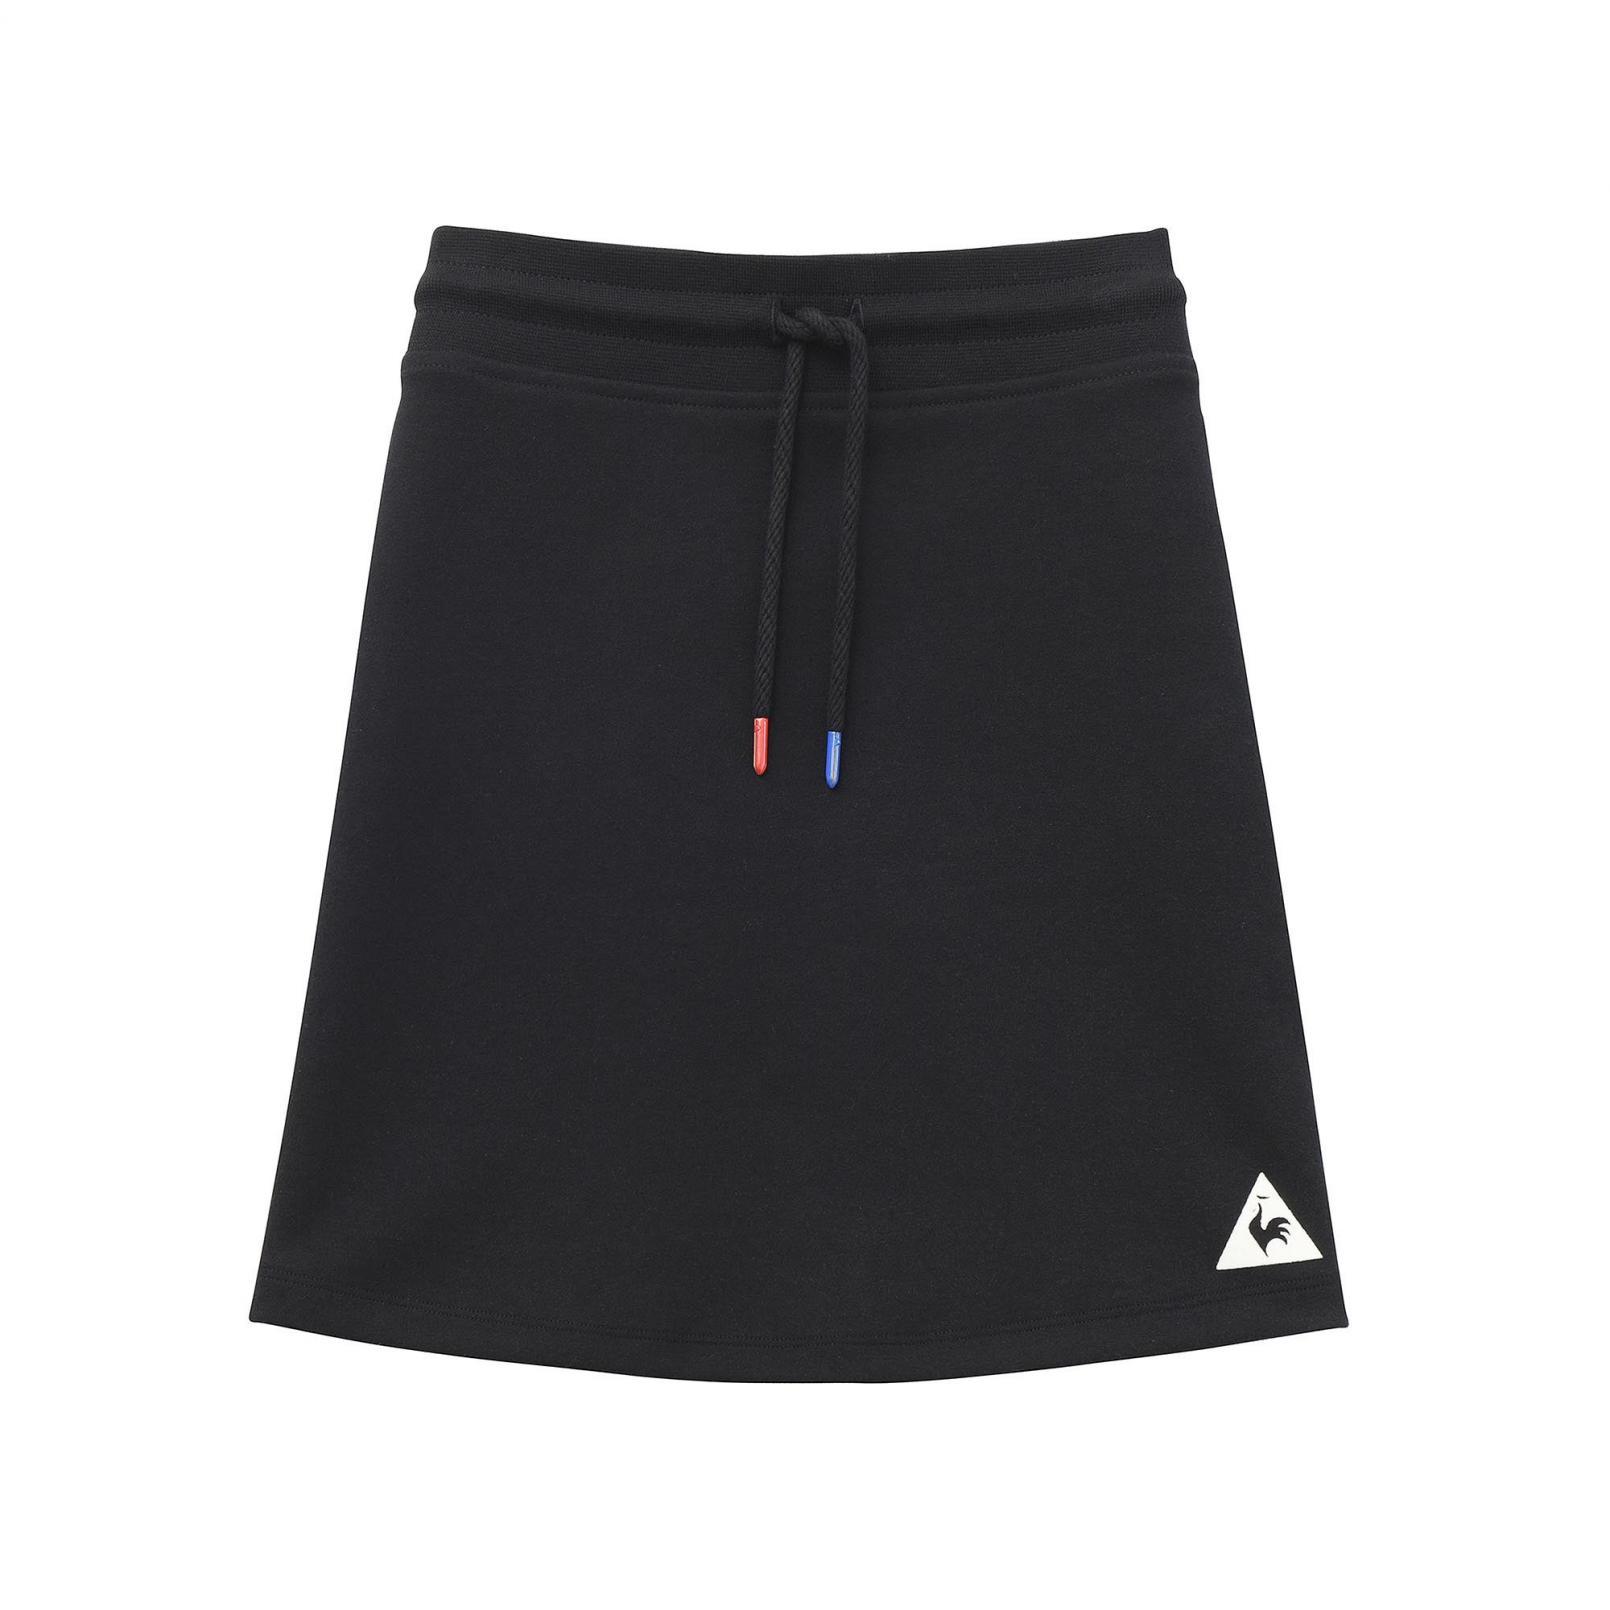 Dresses & Skirts – Le Coq Sportif Tricolore Skirt Black